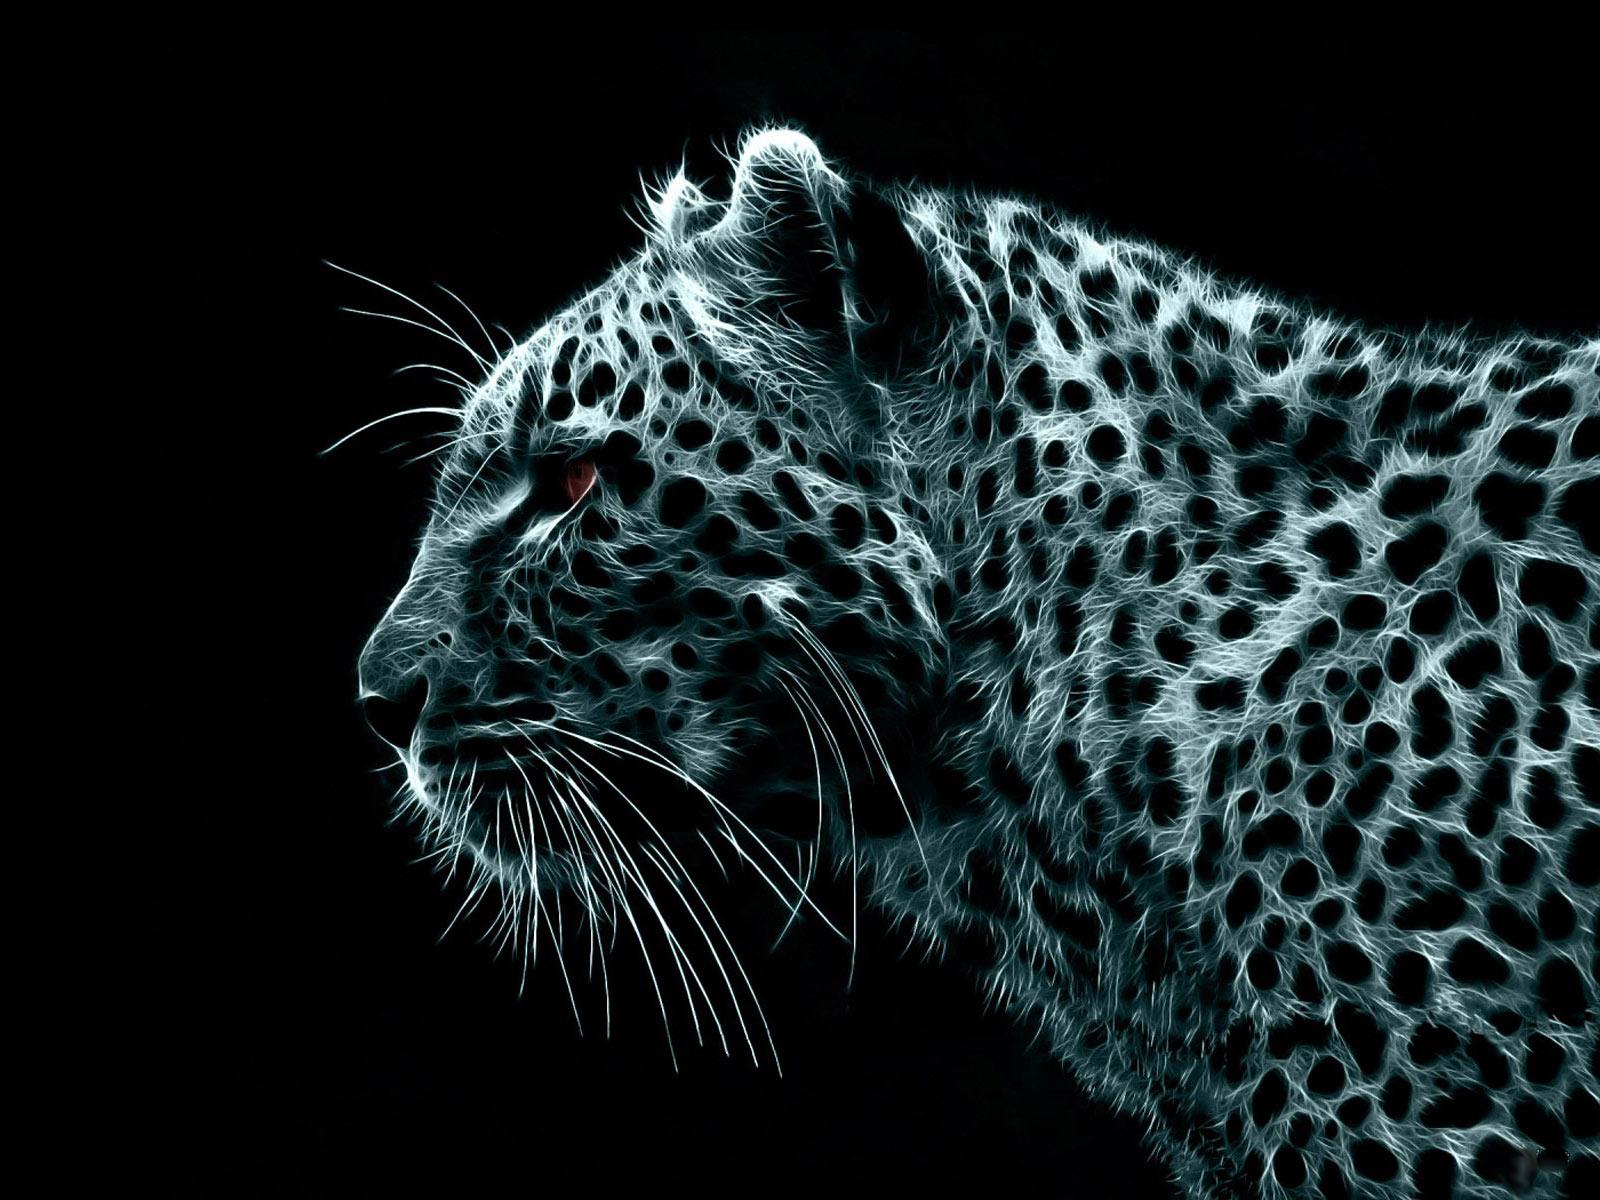 Black Leopard Wallpaper Top Quality Wallpapers 1600x1200